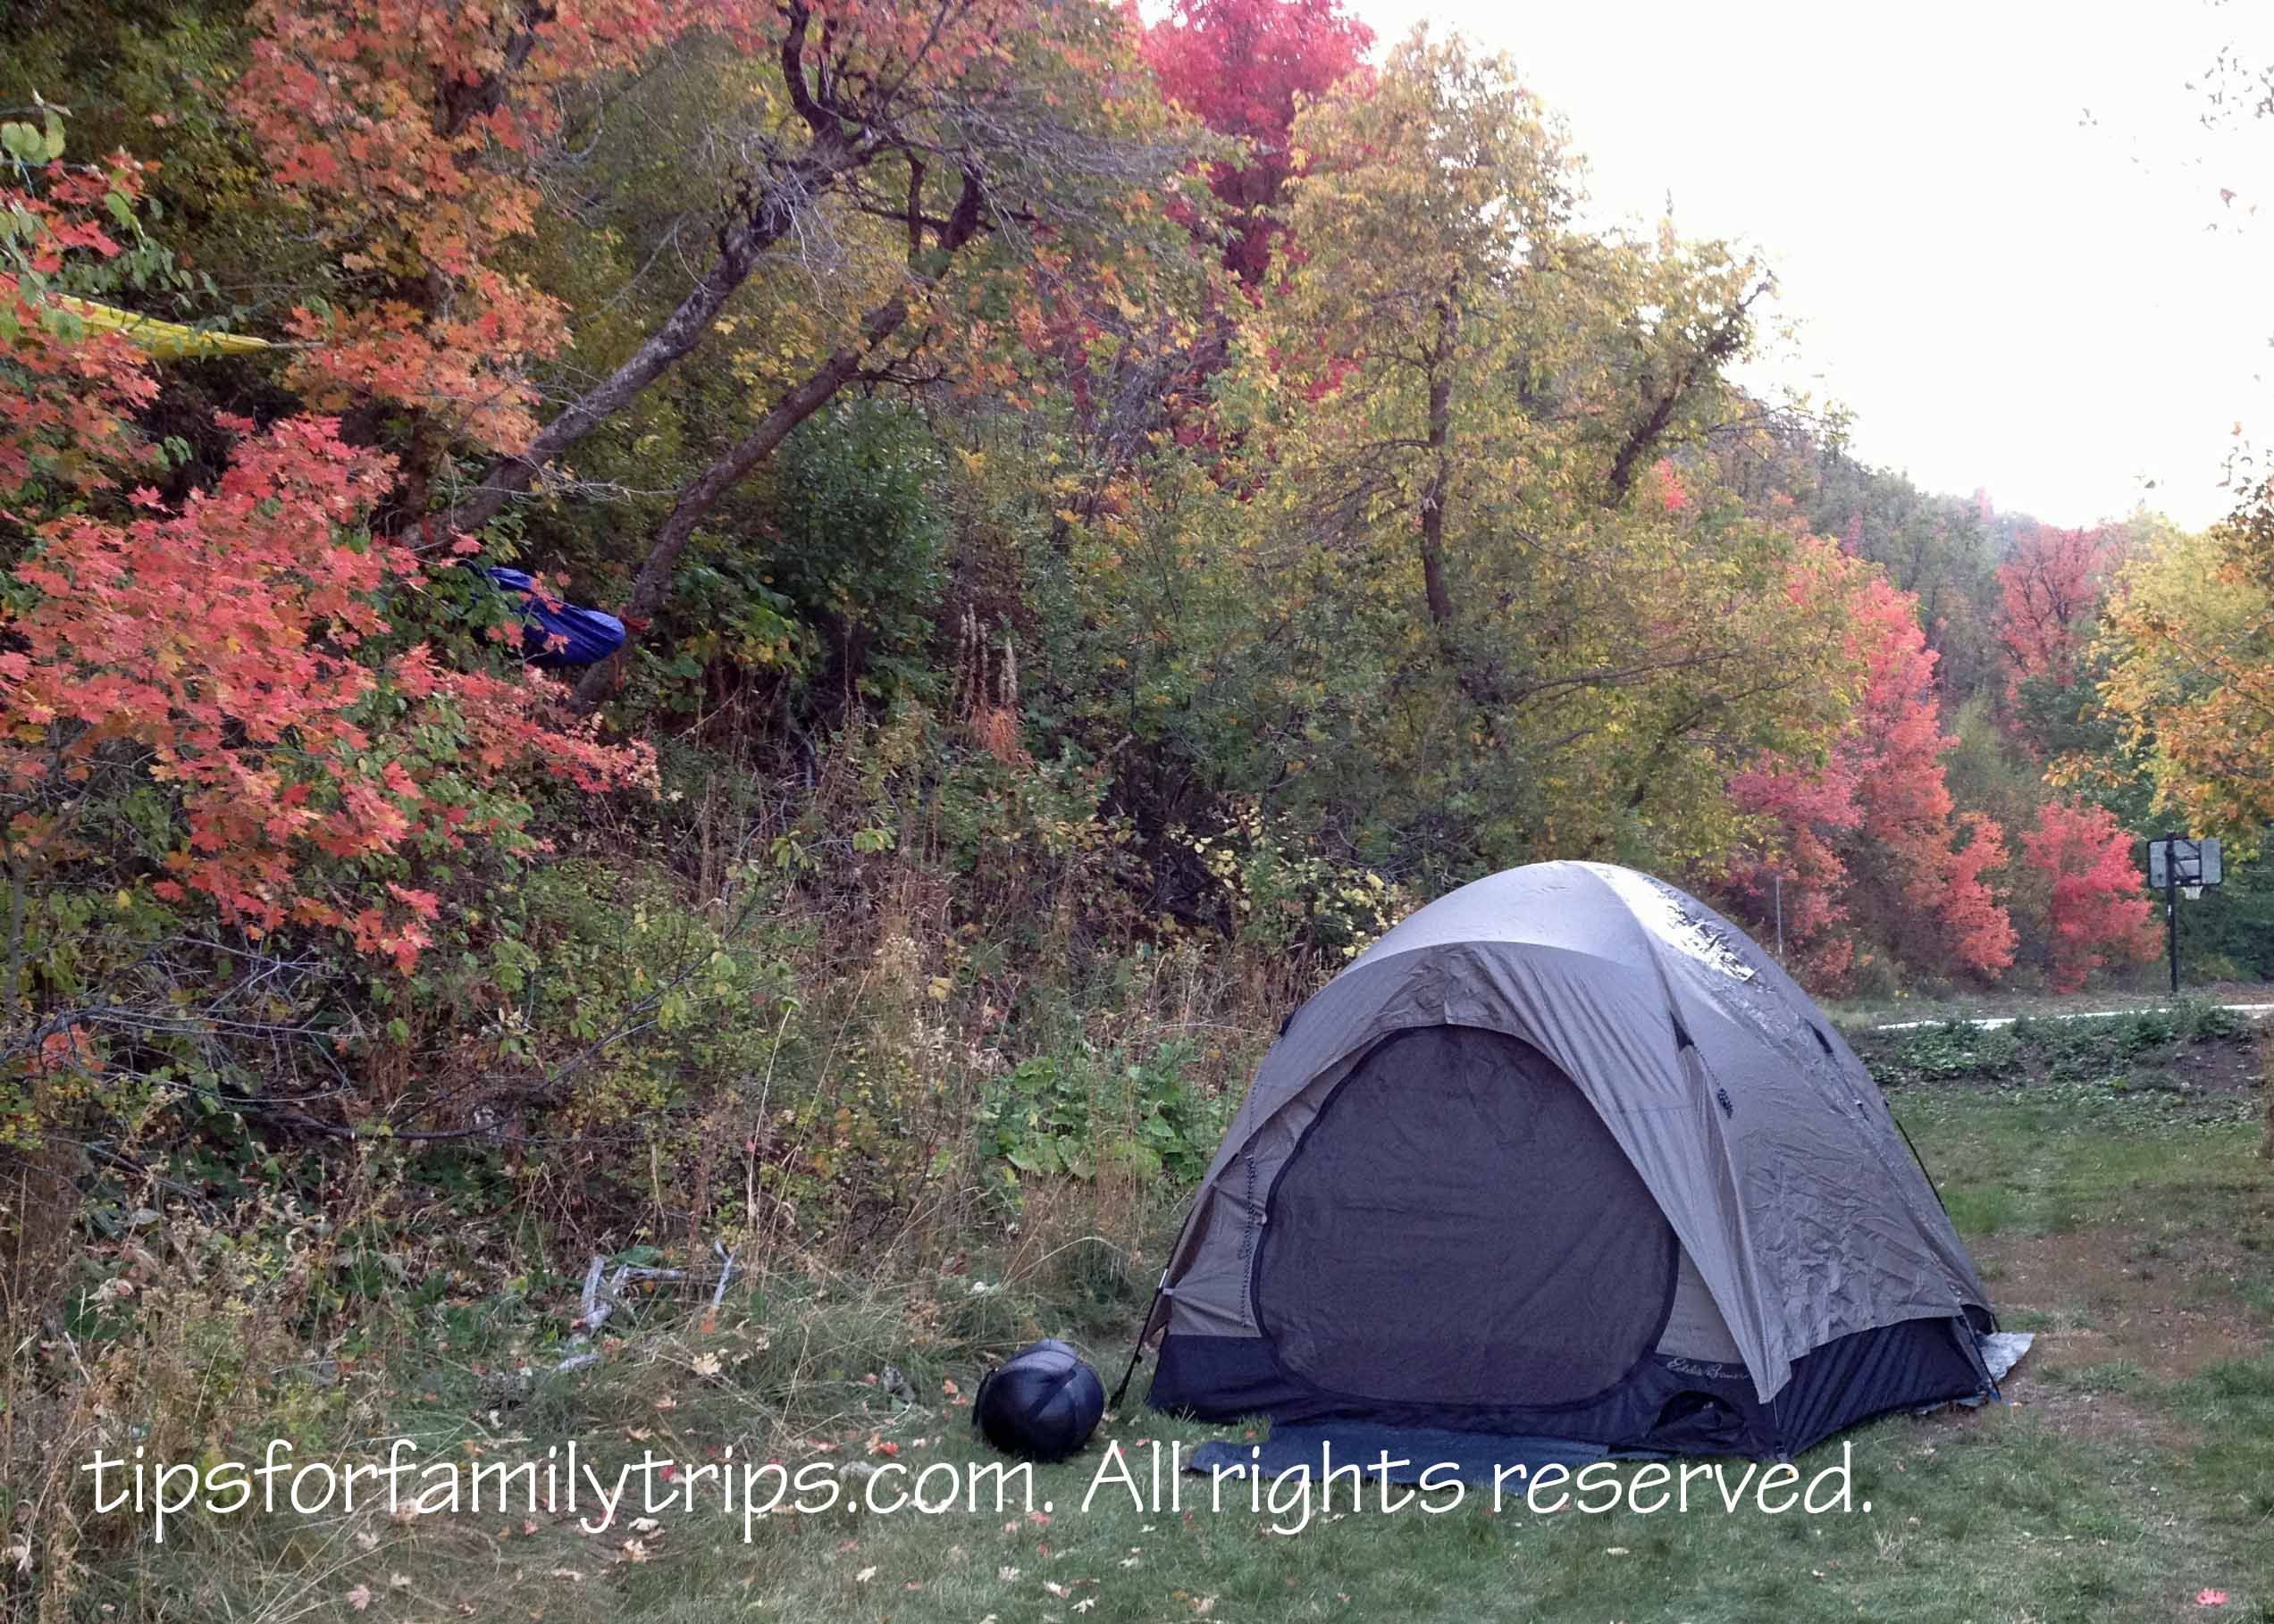 Camping among the fall leaves campingforbeginnersfamiliestips